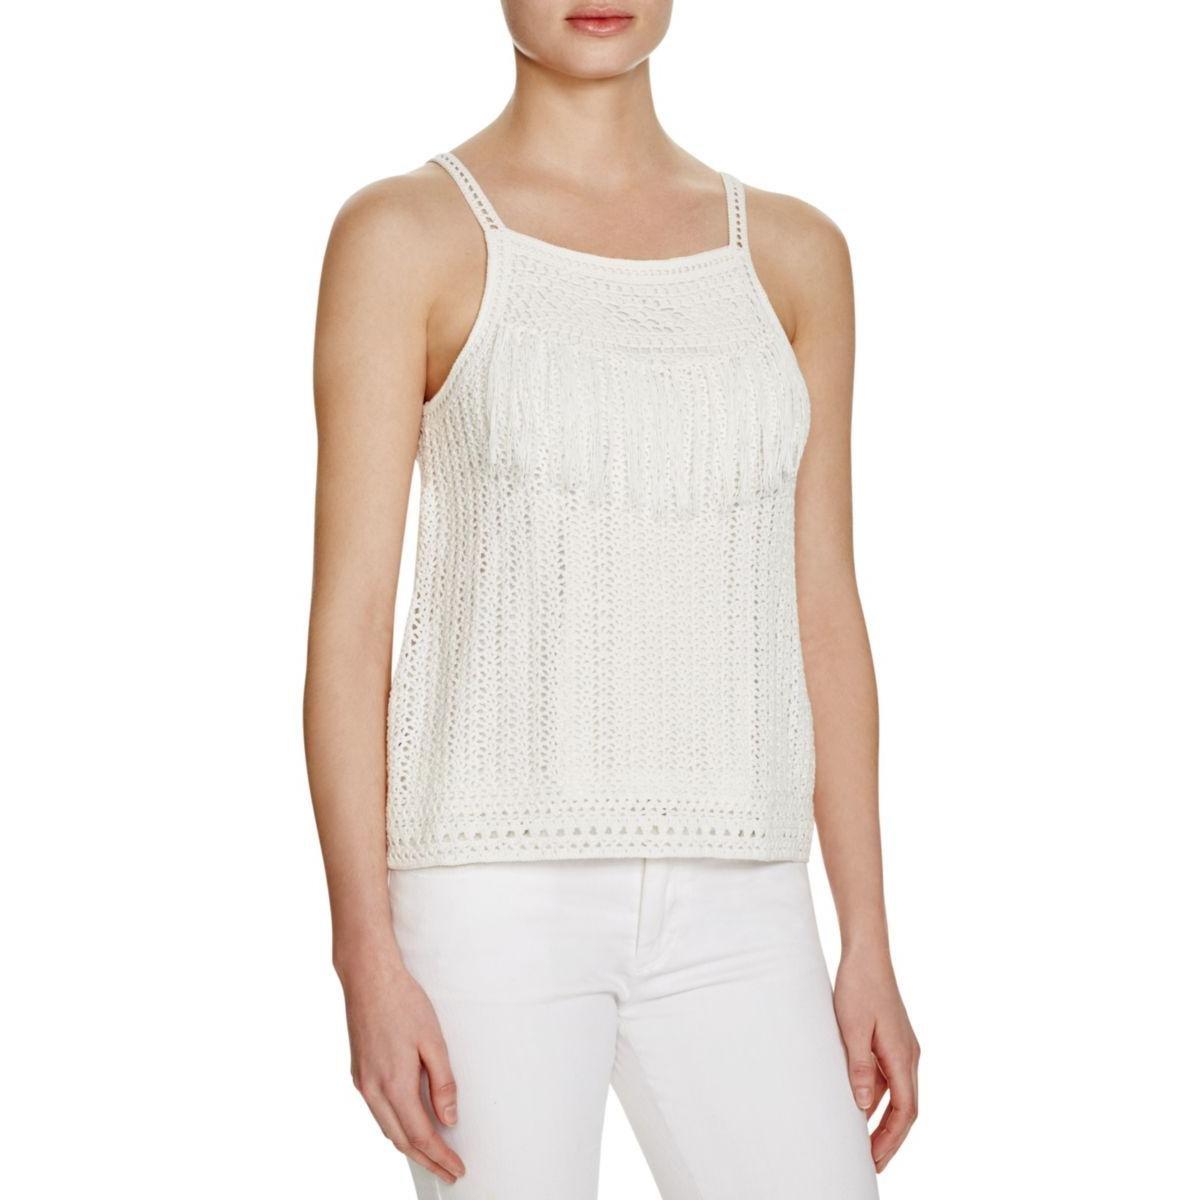 Joie Womens Olesia Crochet Fringe Casual Top White M